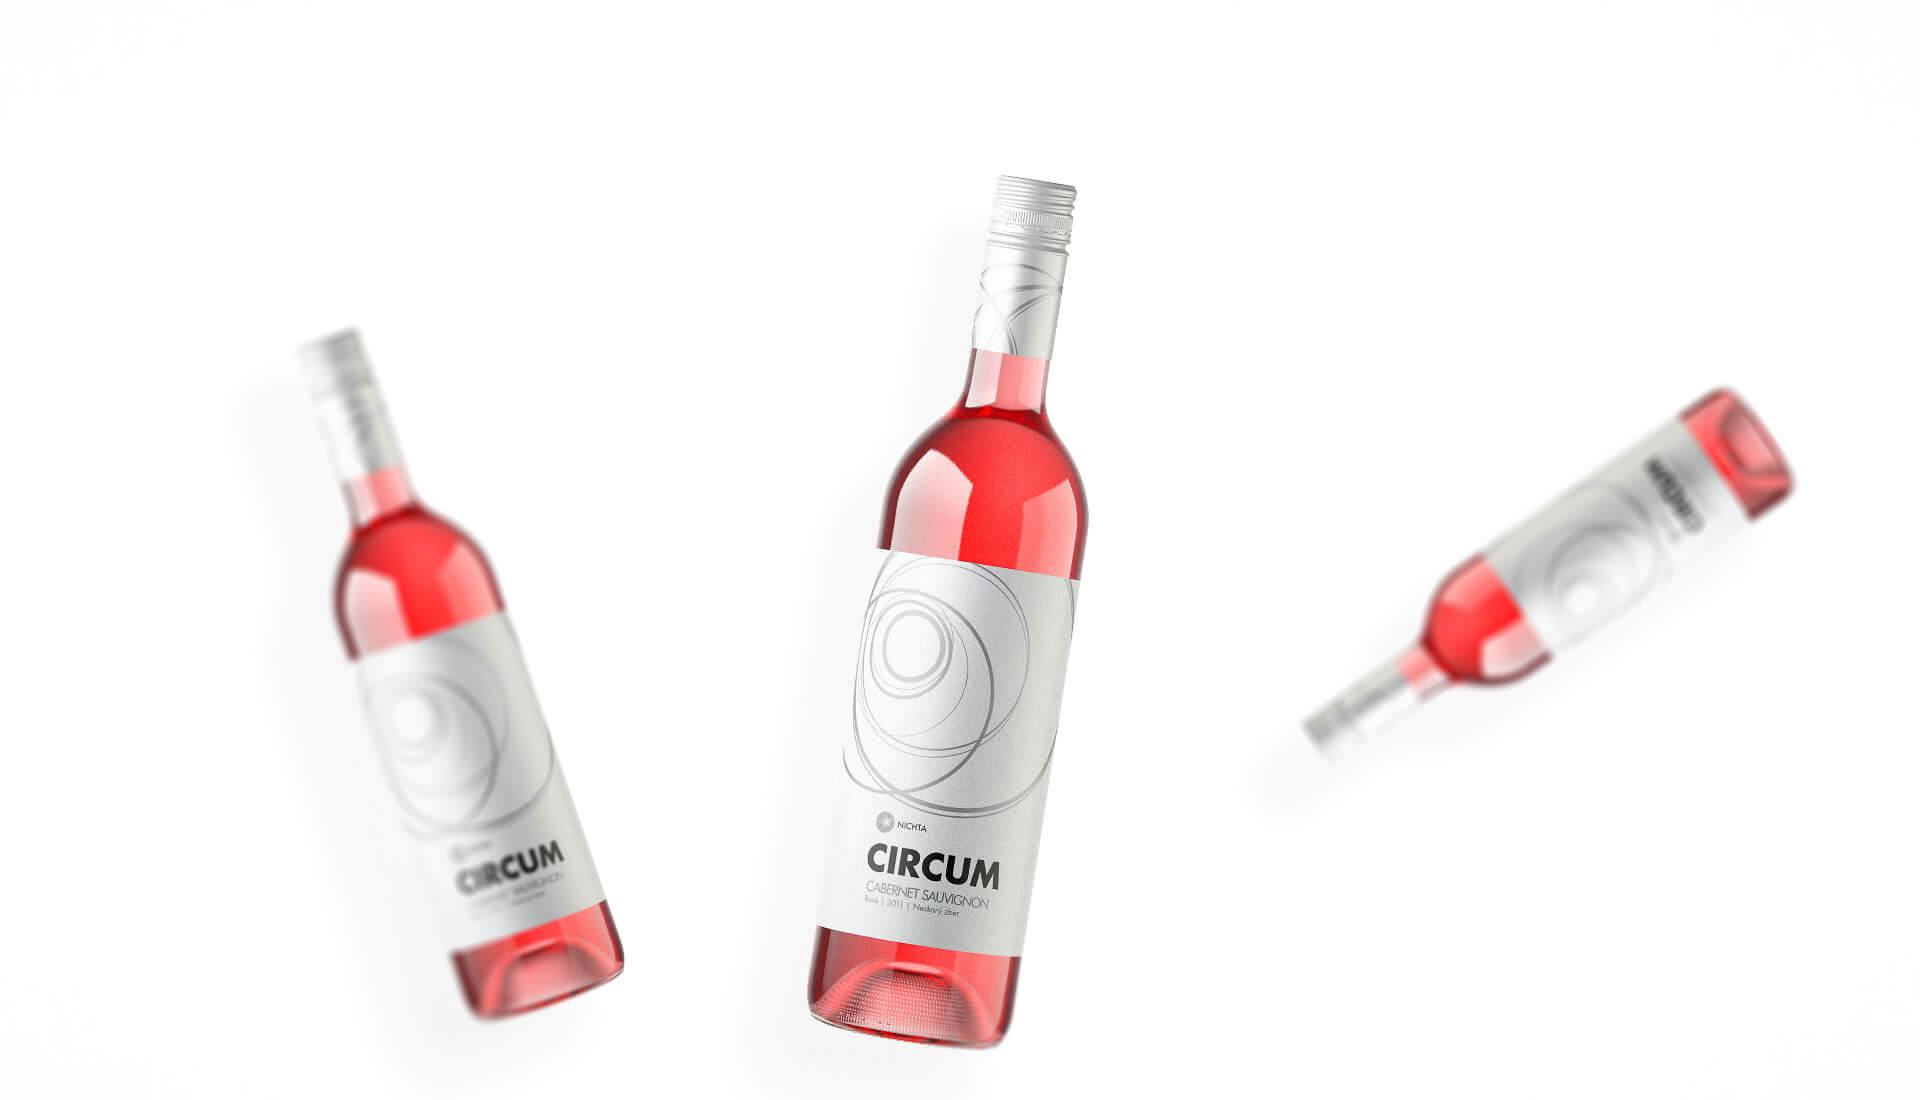 Wine label packaging design CIRCUM NICHTA winery rose wines